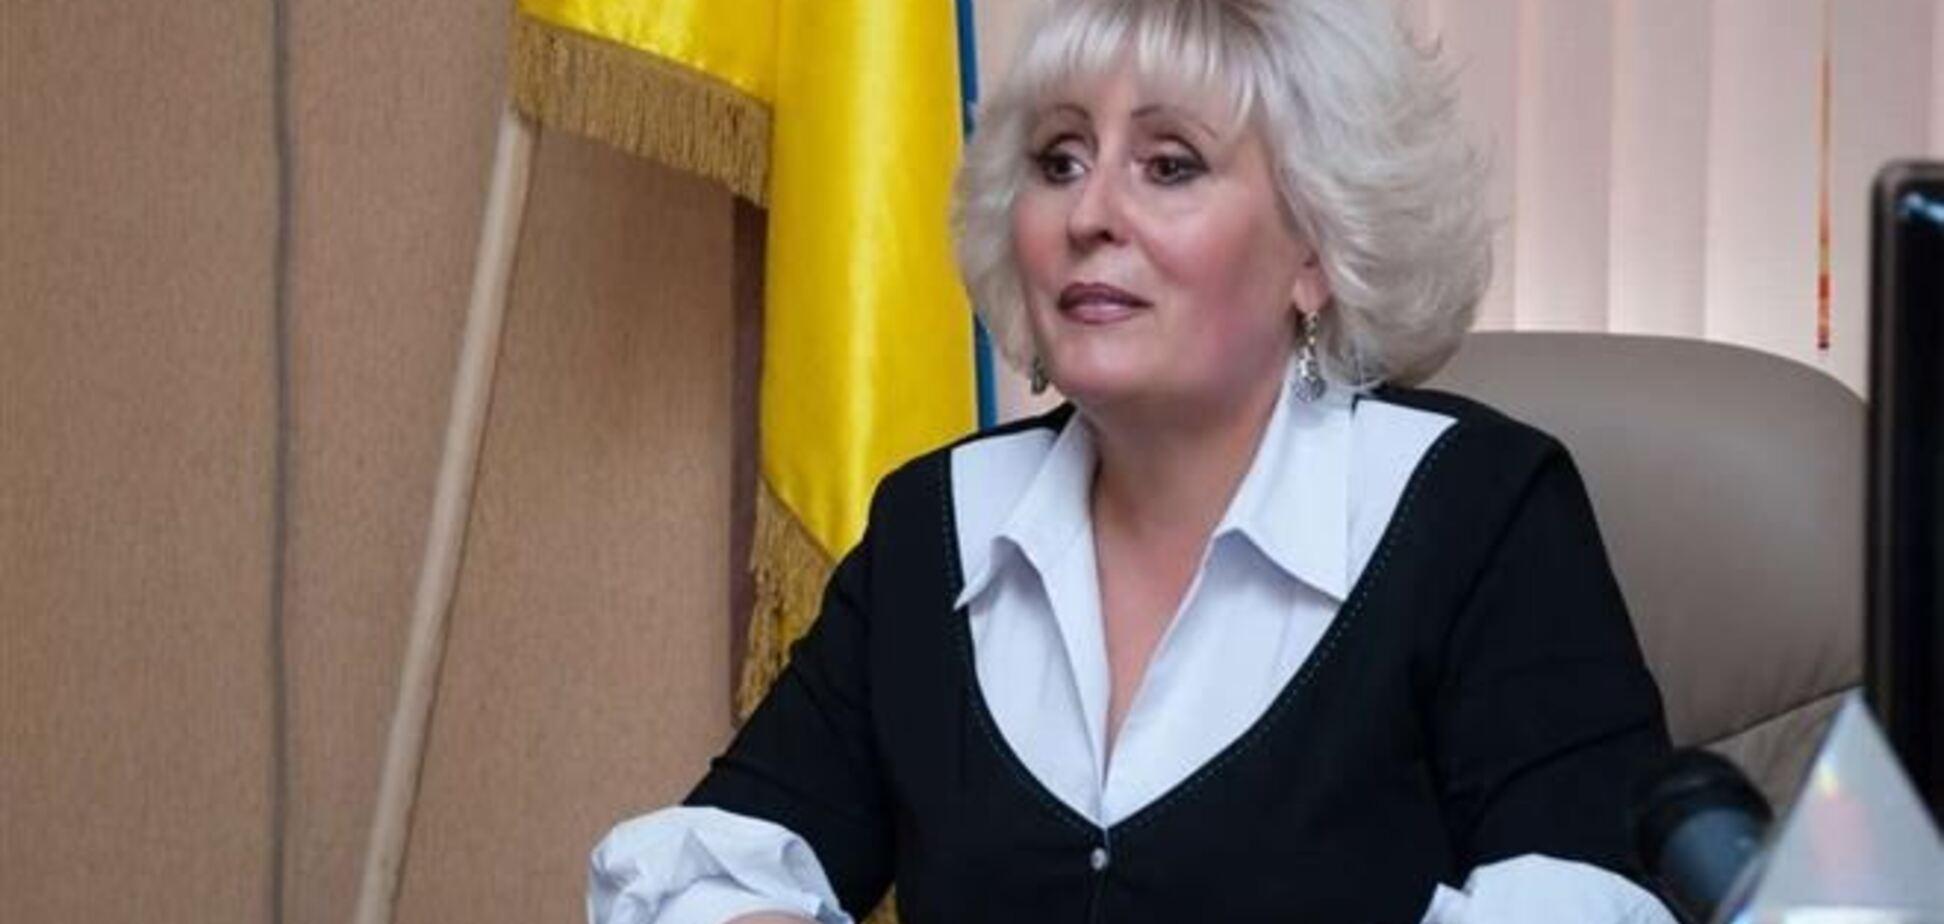 Против мэра Славянска открыли дело за сепаратизм